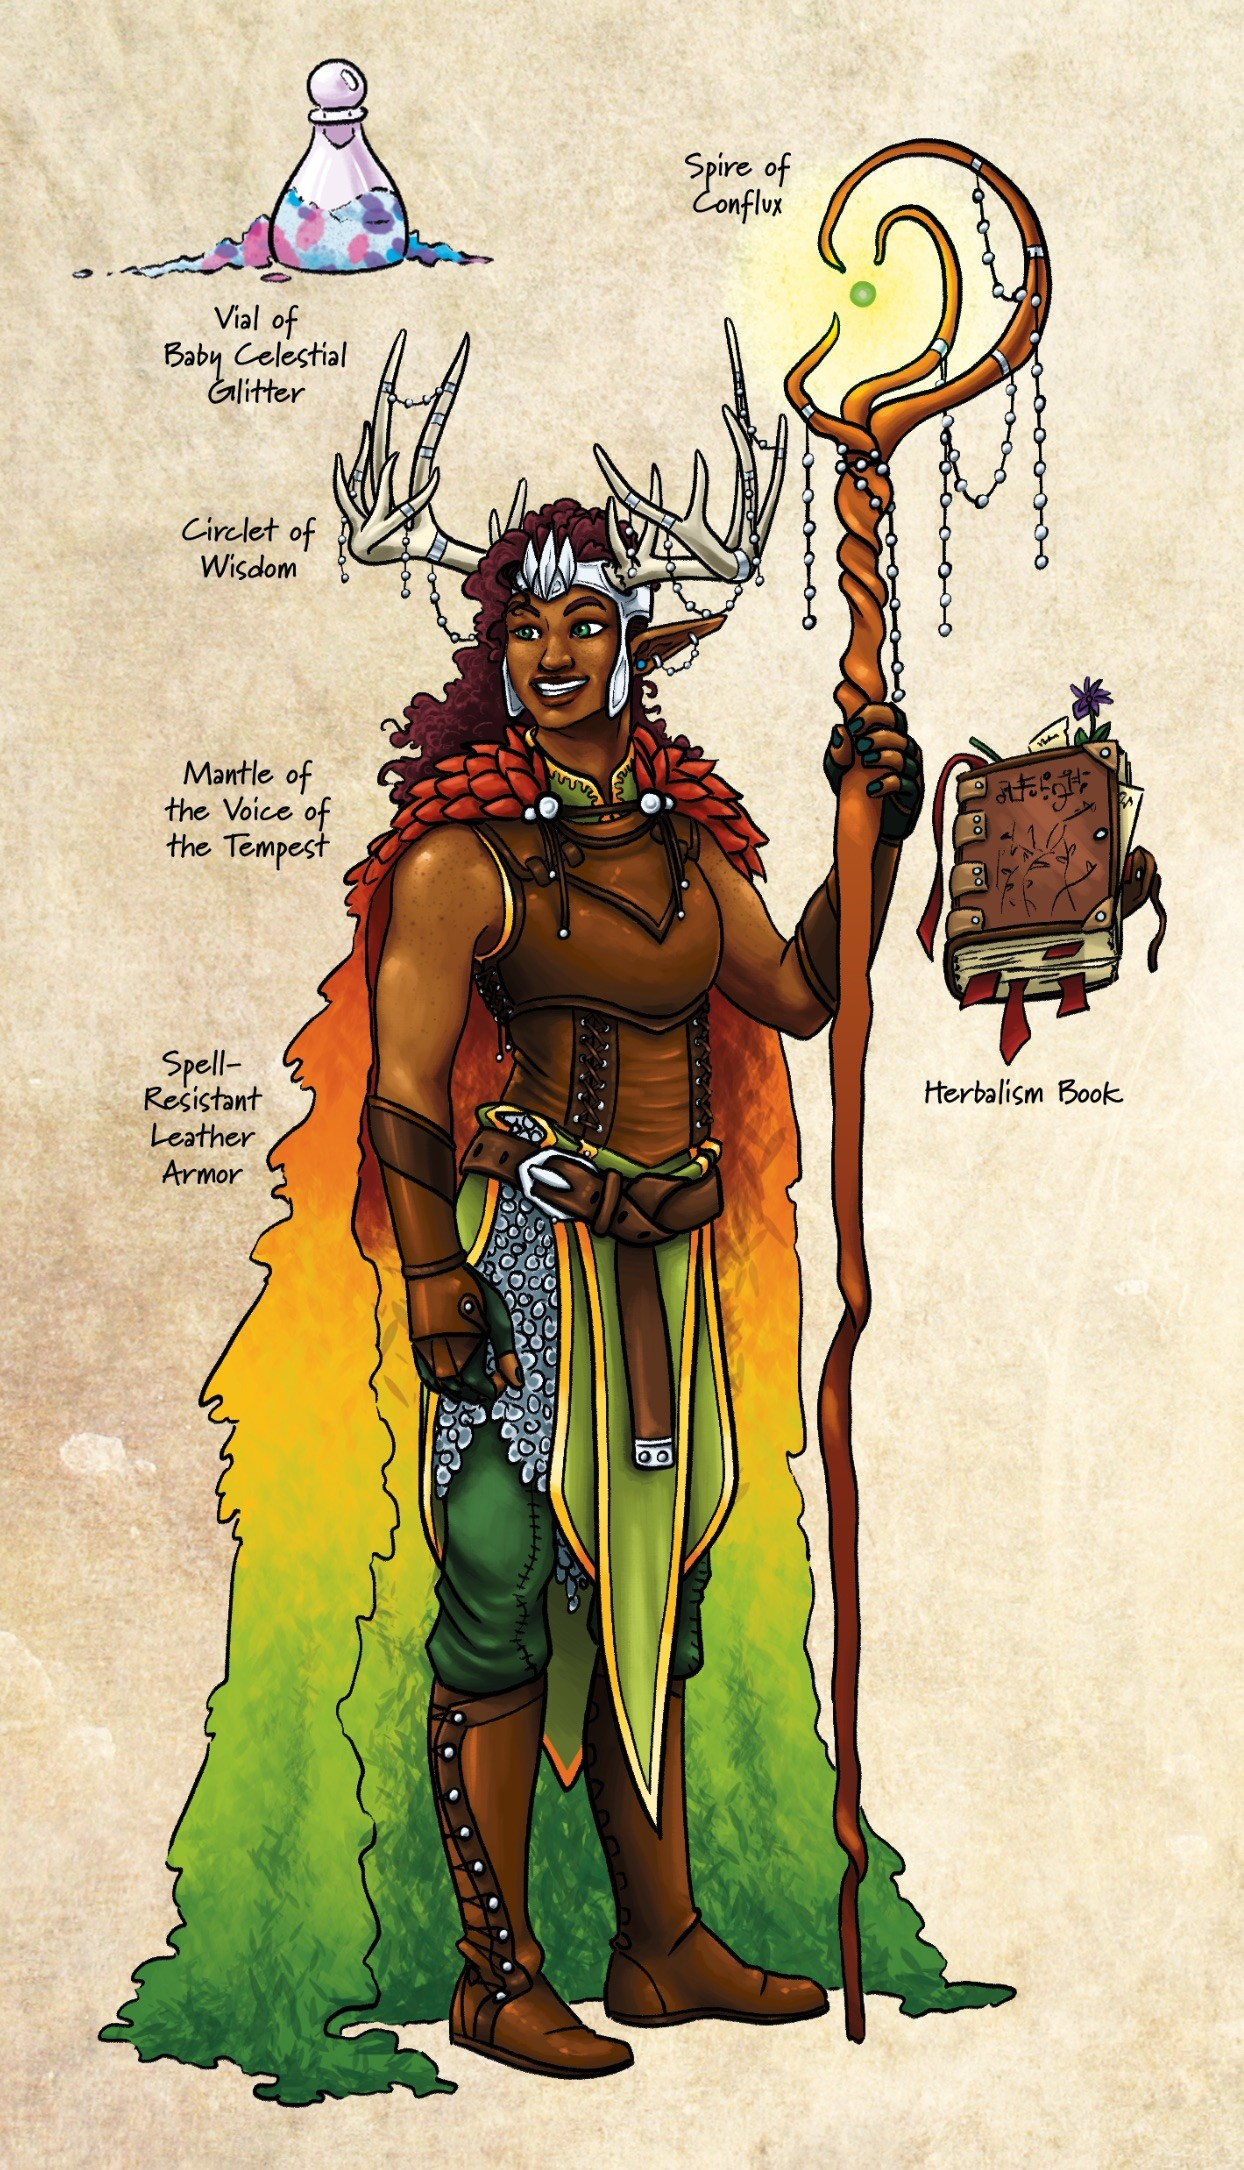 Artstation Critical Role Vox Machina Character Spread Grace Kooken +5 deflection bonus to armor class. critical role vox machina character